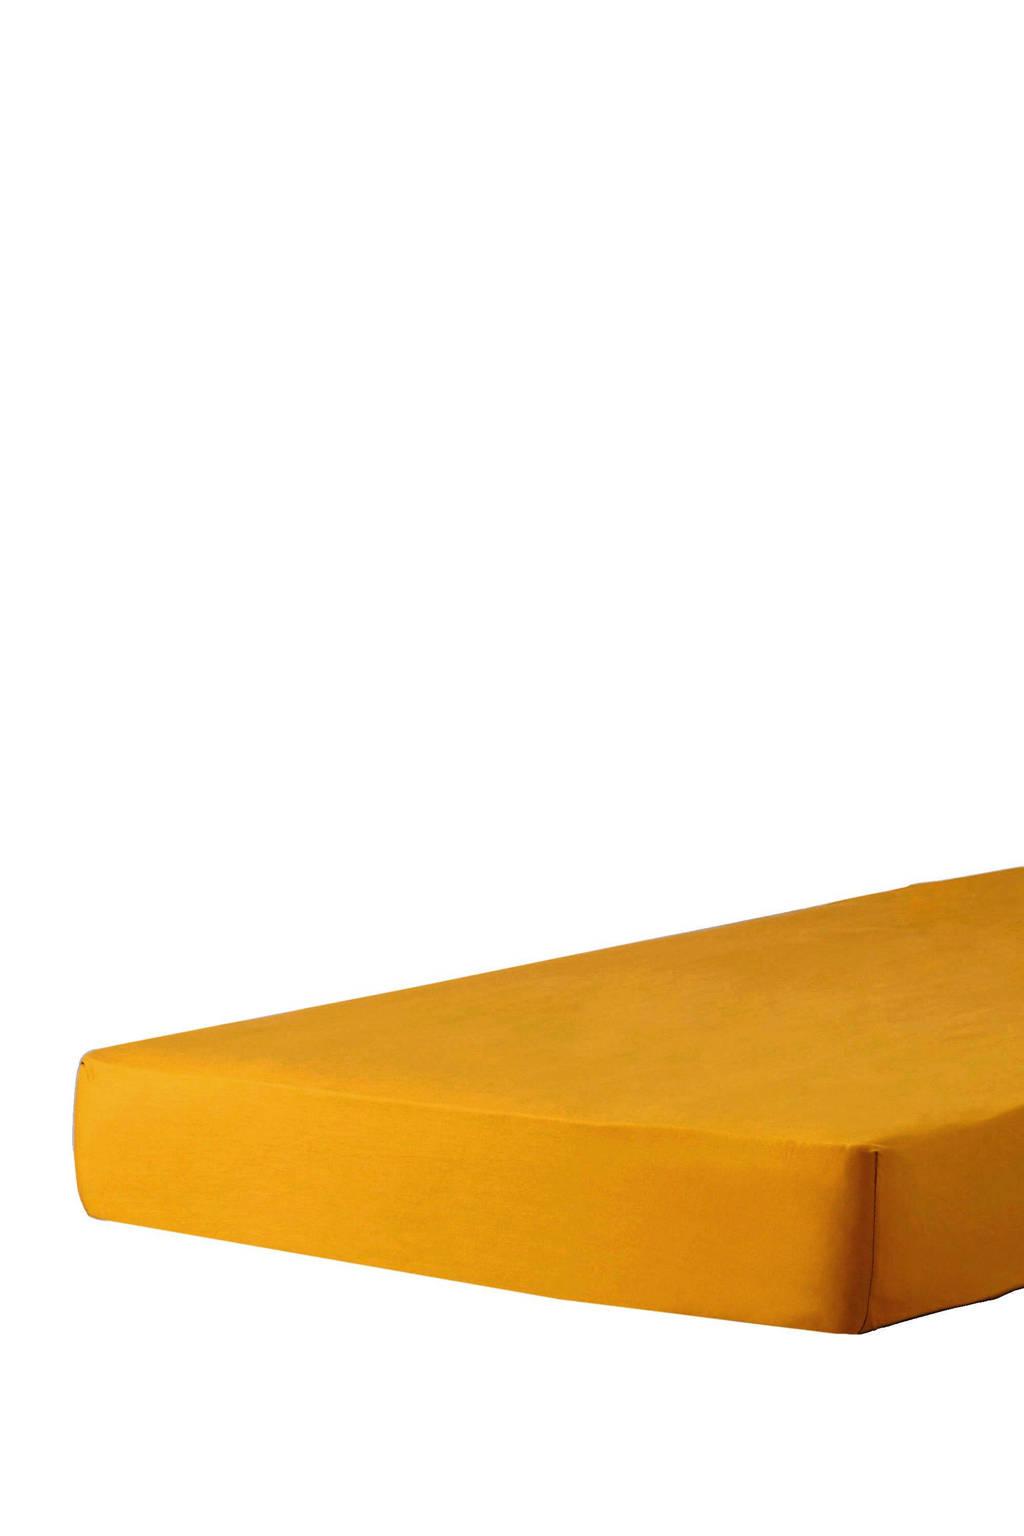 whkmp's own katoenen peuterhoeslaken (70x150 cm) Donker okergeel